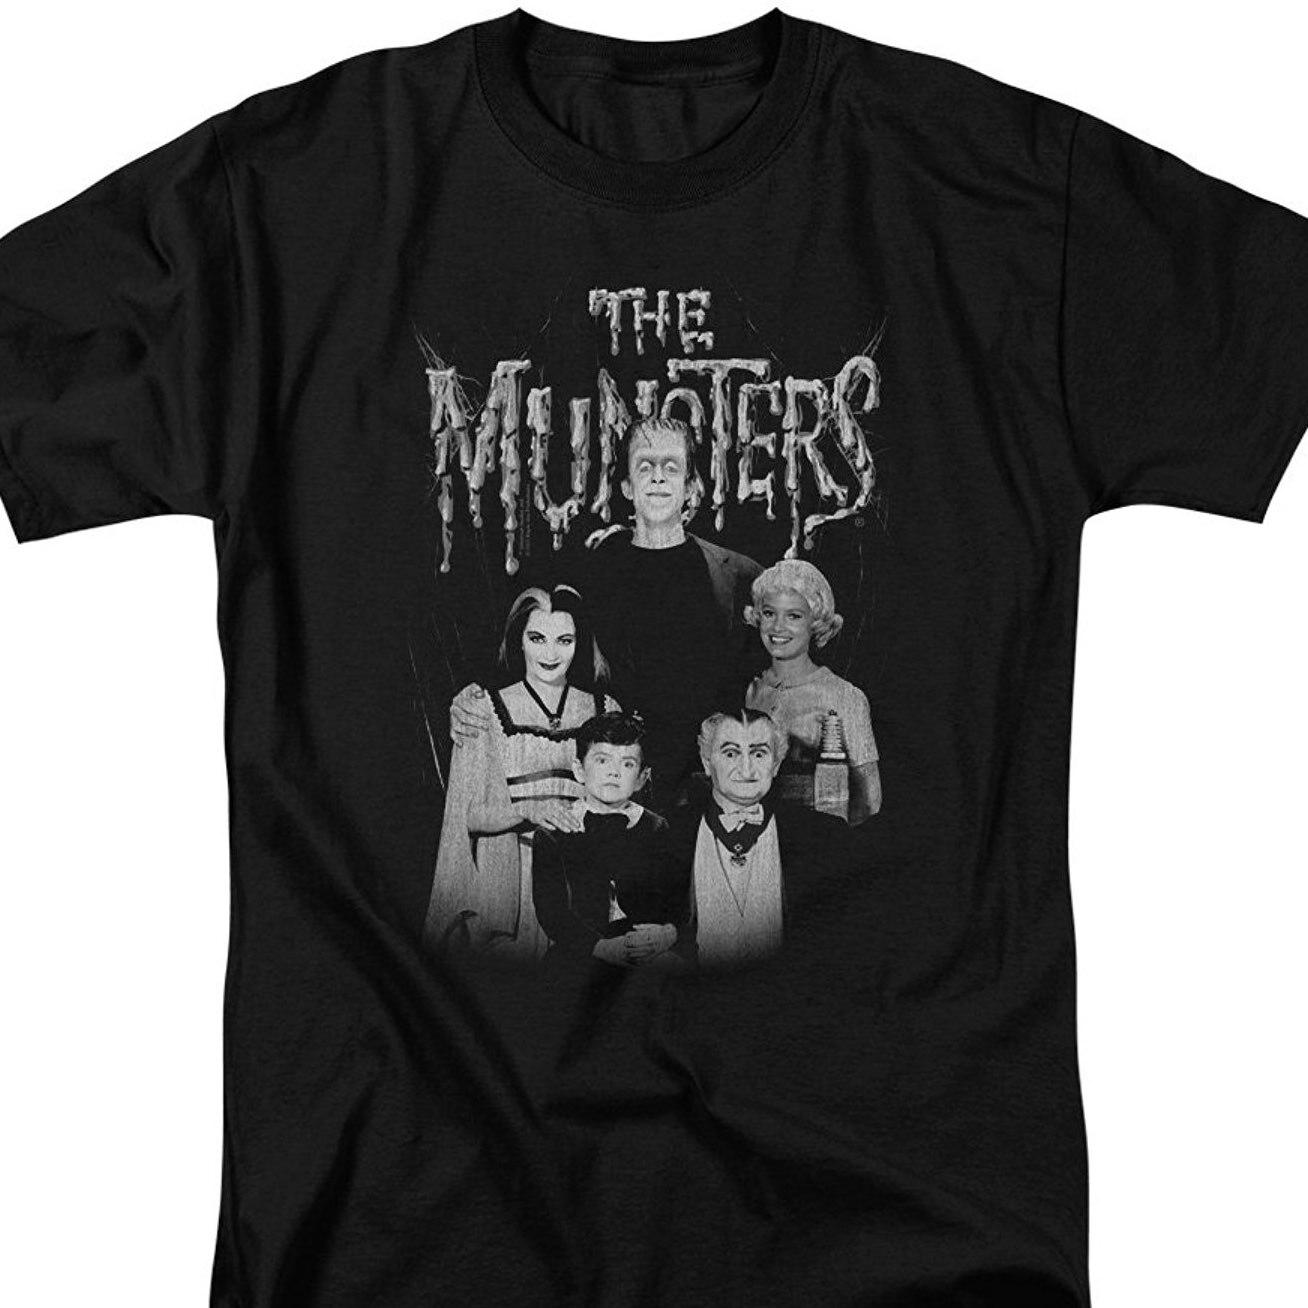 Print T-shirt Man Korte De Munsters Monster Familie Sitcom Tv Show Familie Portret Volwassen T-shirt Tee 035424